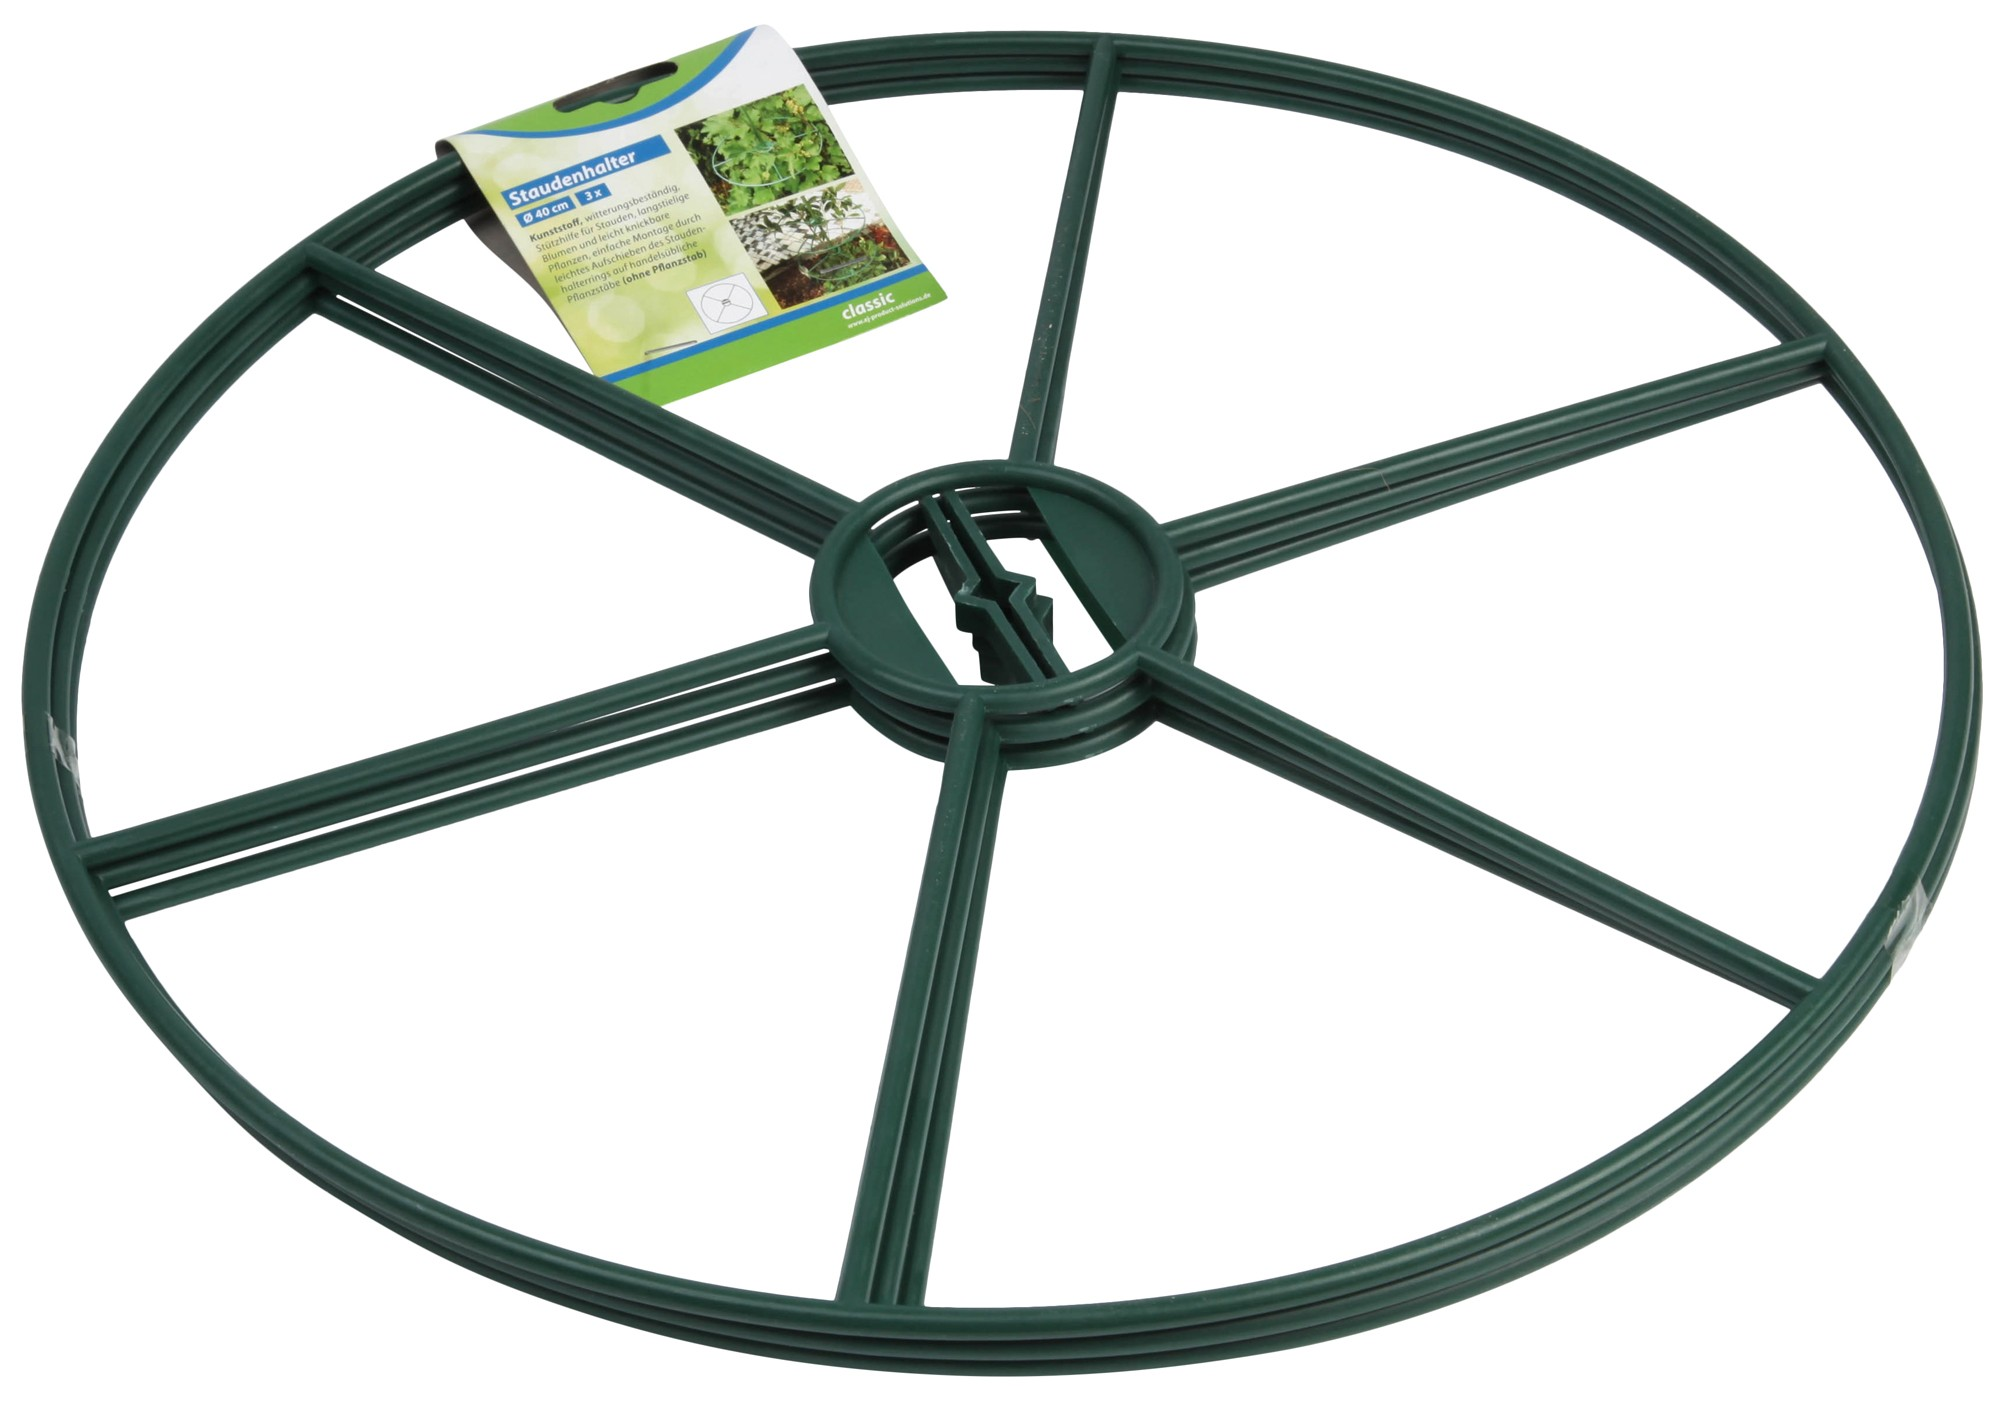 Staudenhalter / Rankhilfe classic floraworld Ø40cm grün 3 Stück Bild 1